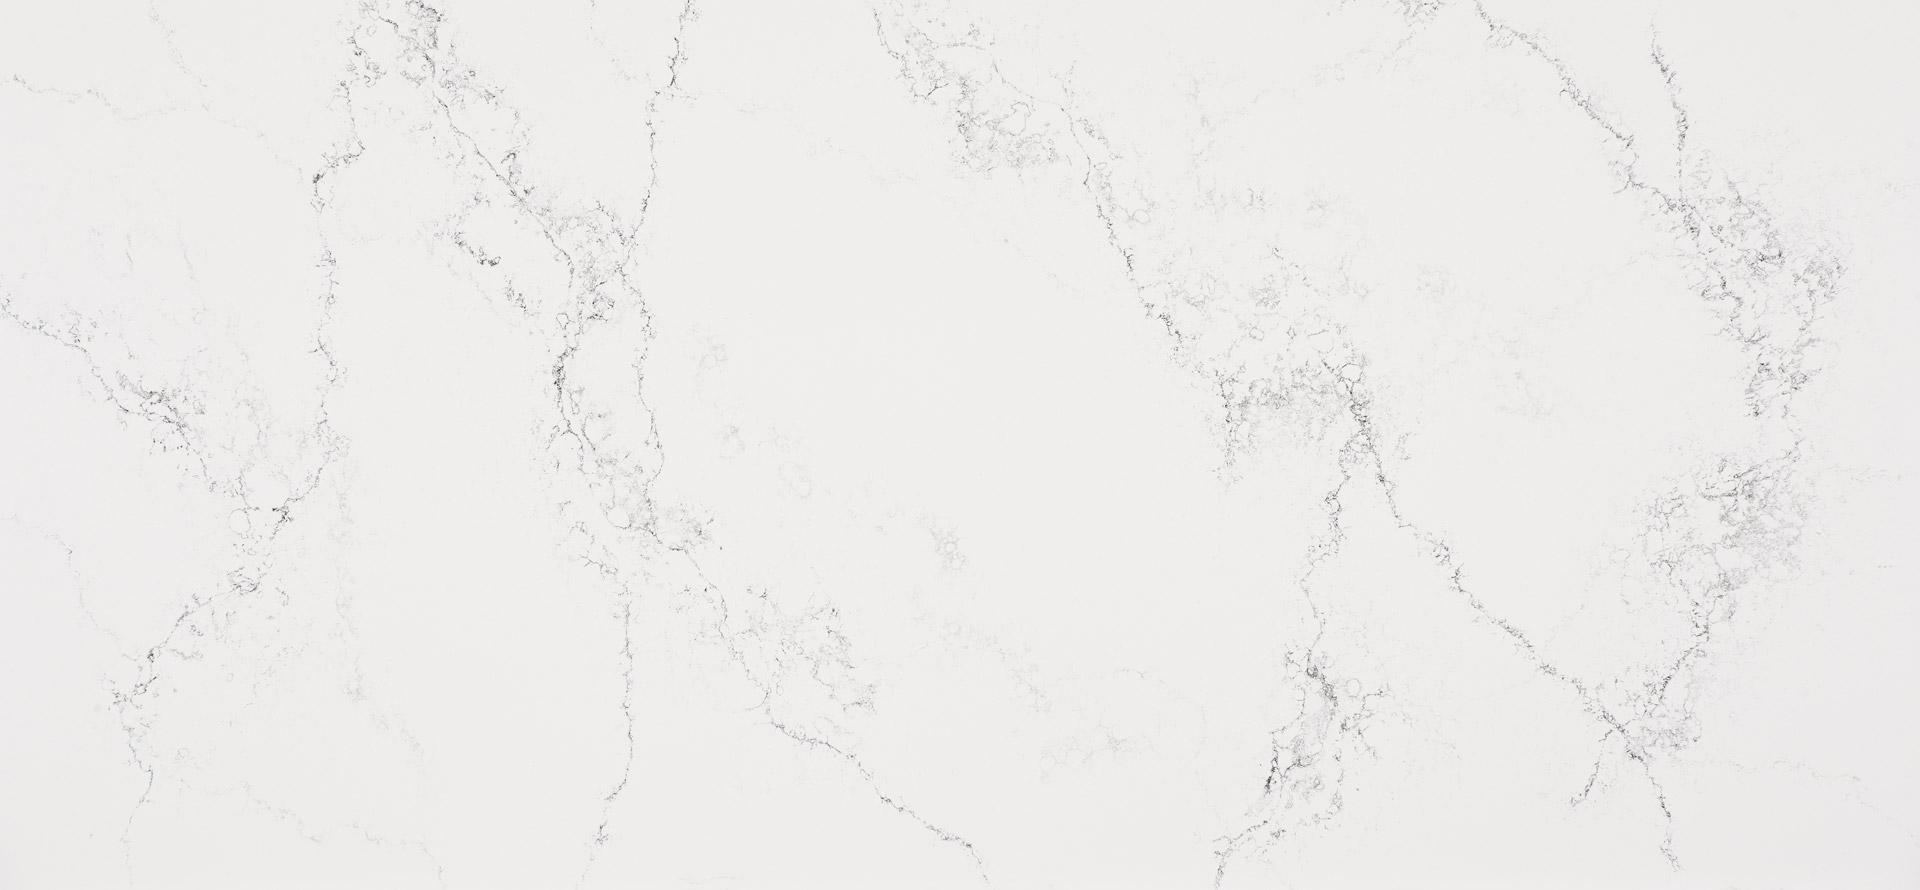 squarerooms-caesarstone-empira-white-marble-quartz-counter-kitchen-surface-texture